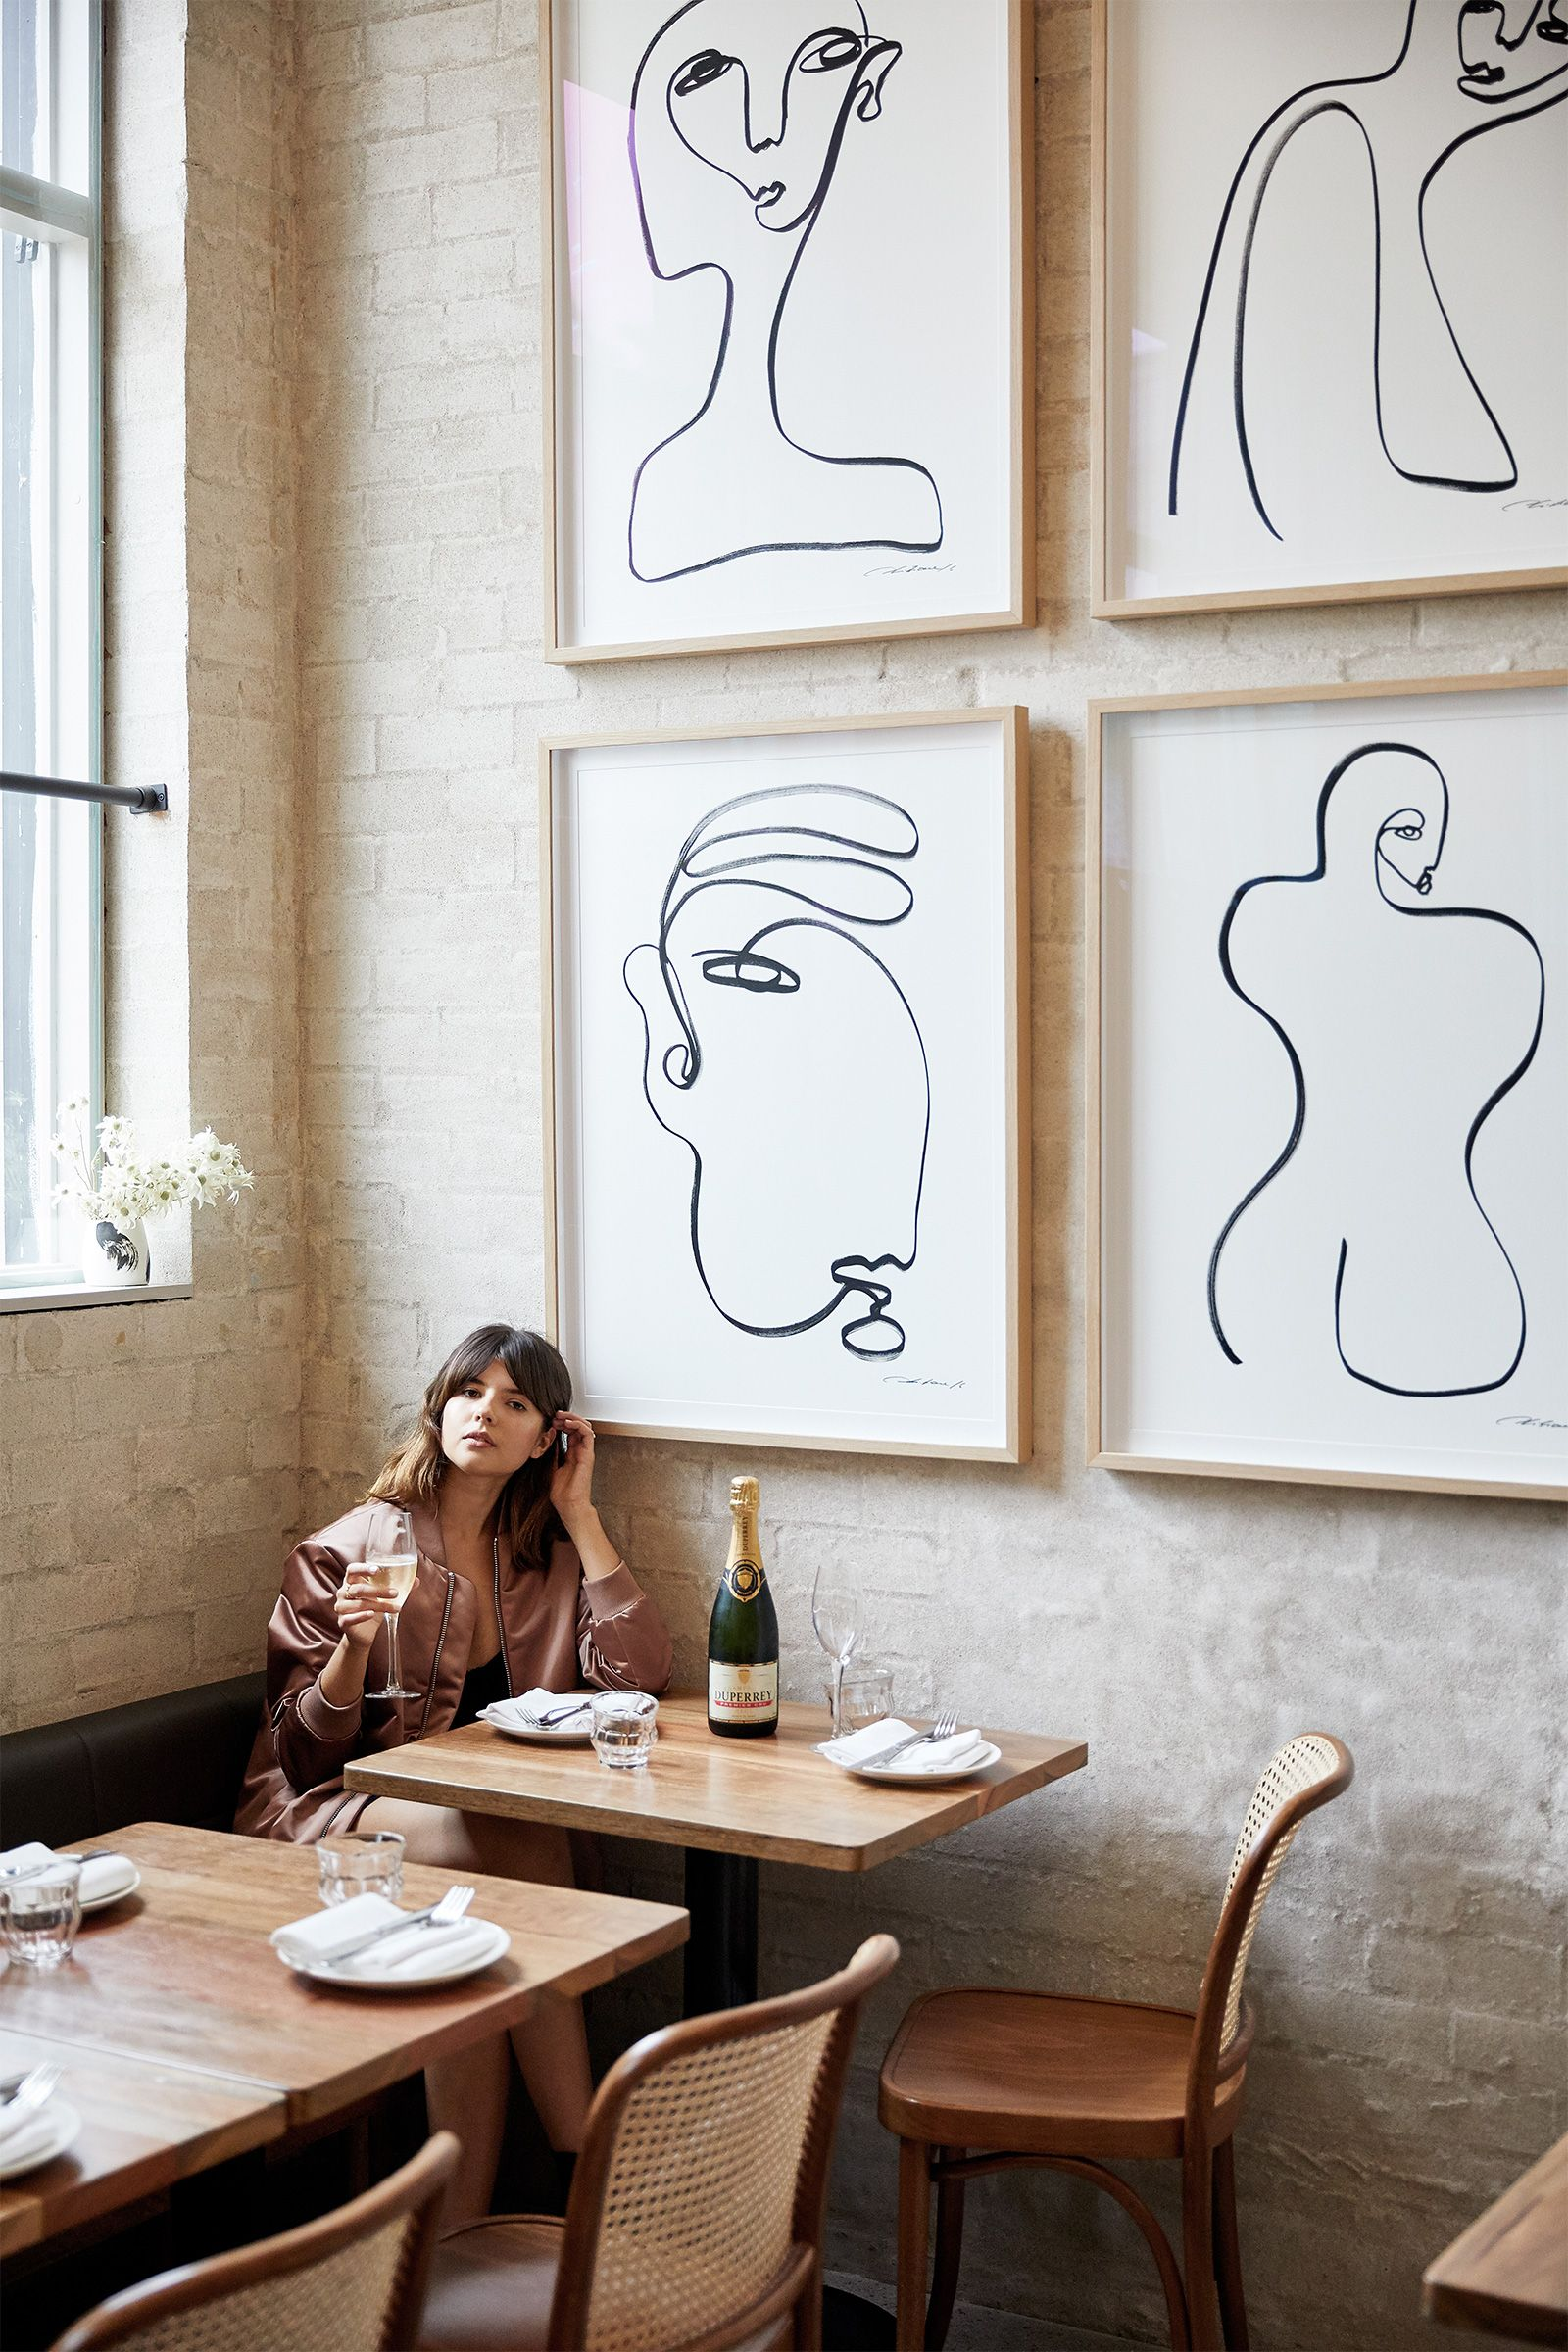 Modern restaurant line drawing cus s p a c e s pinterest